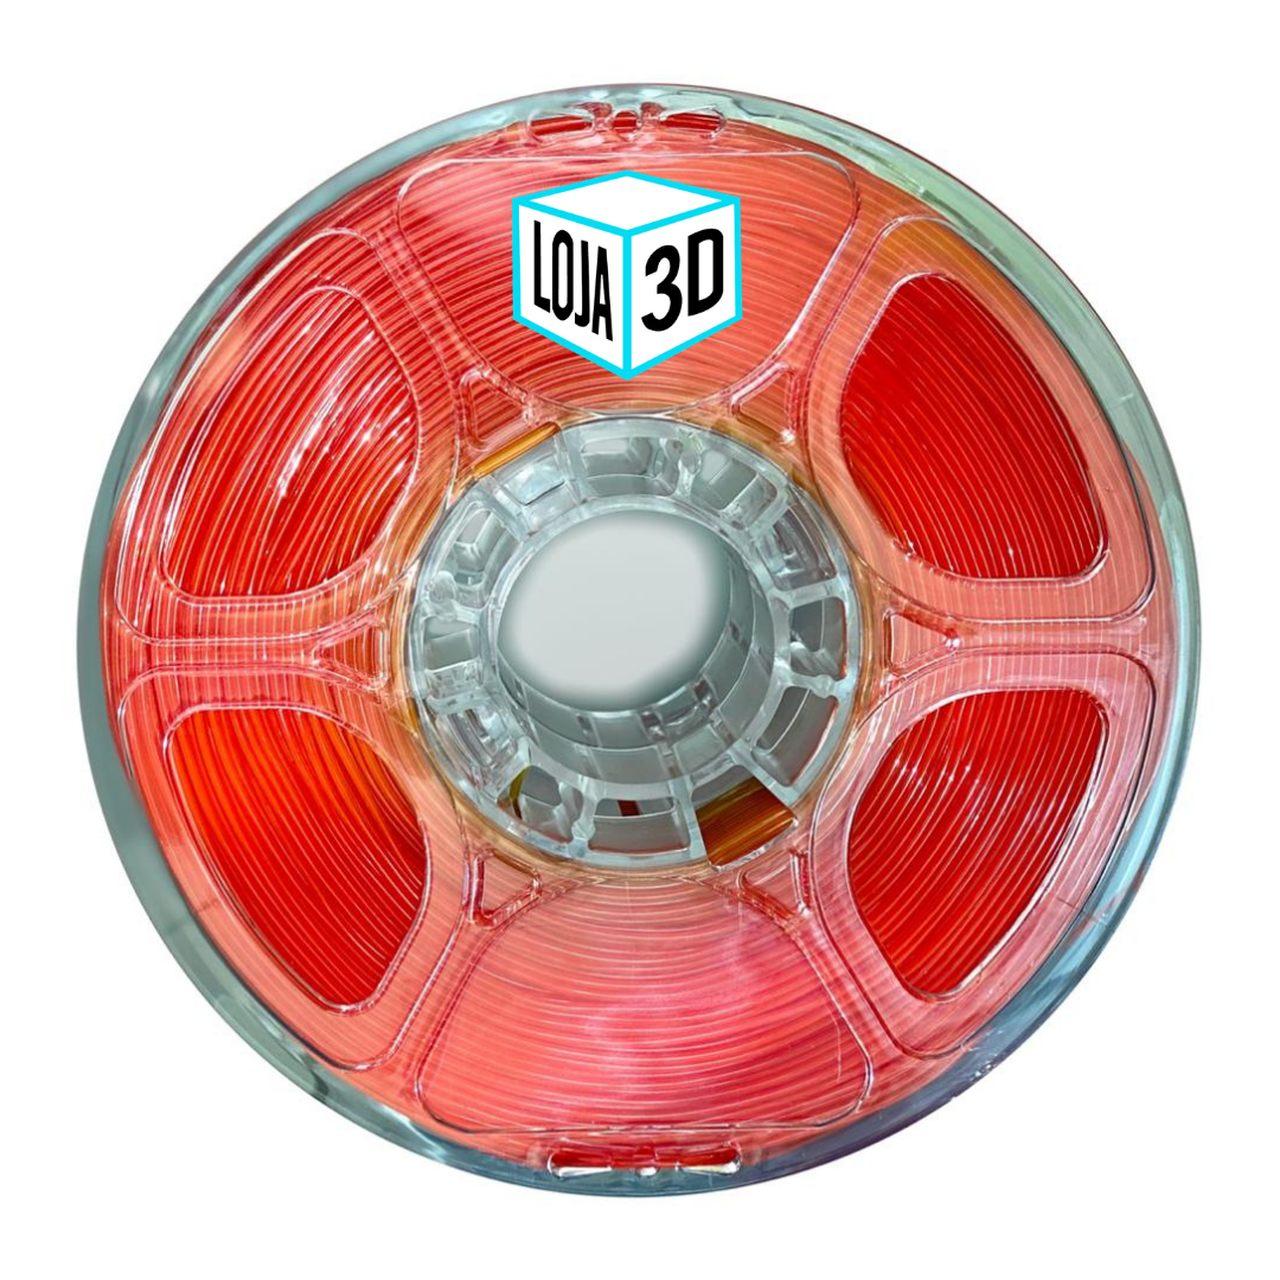 Filamento Flex TPU Premium - Vermelho - Loja 3D - 1.75mm - 1kg